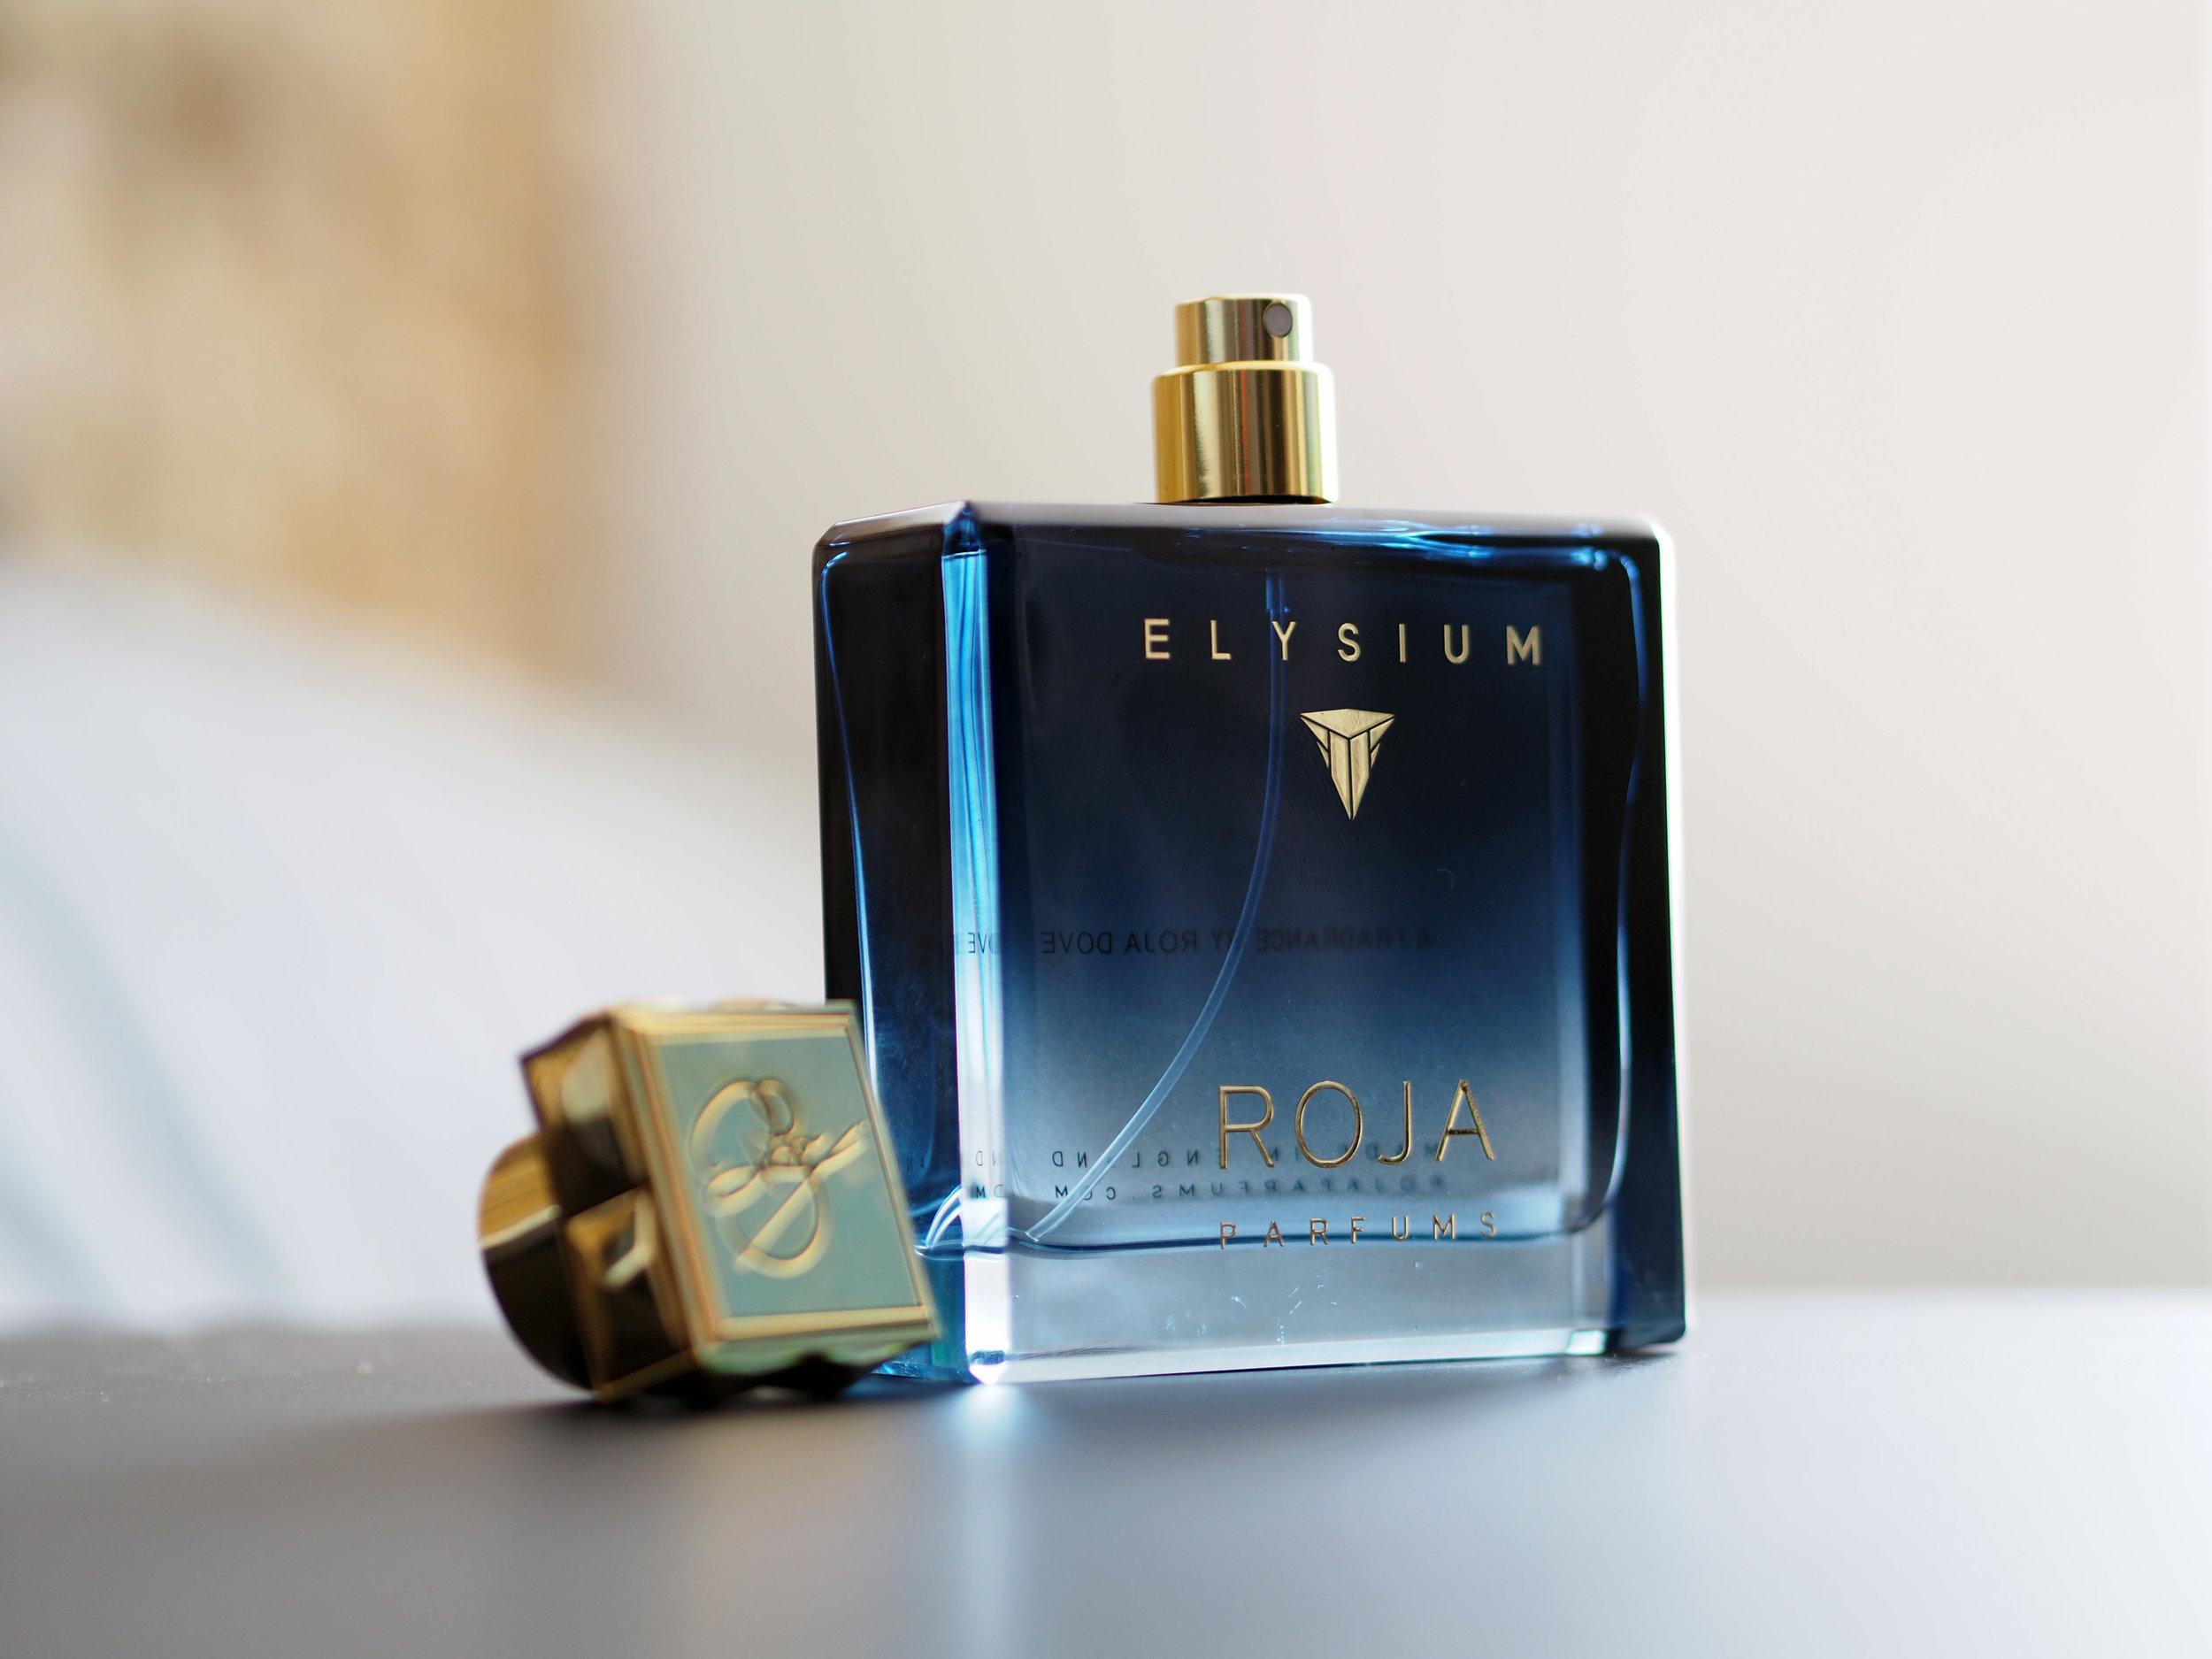 Roja Elysium Fragrance.jpg